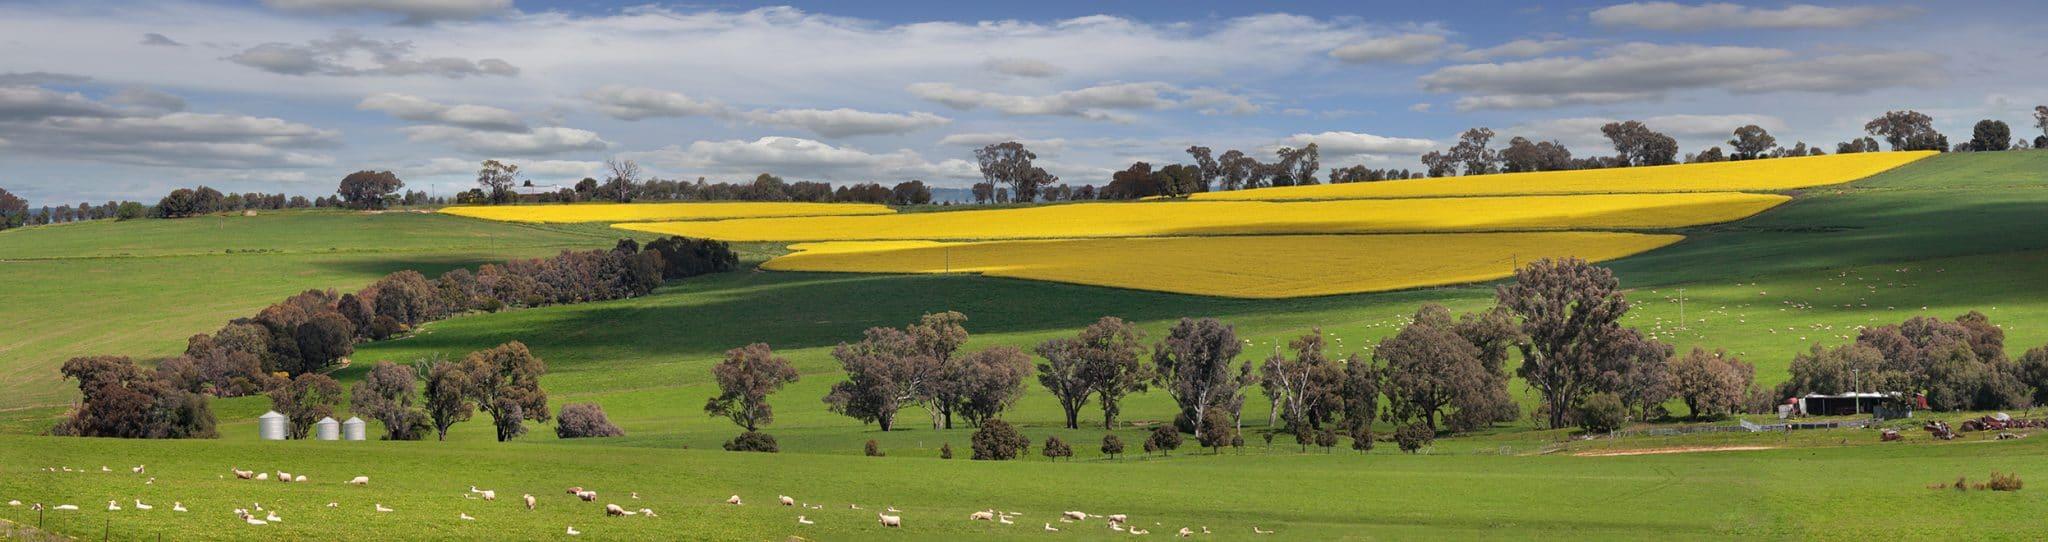 Farm Quotes 5 Farm Insurance Quote Tips  Quotesonline